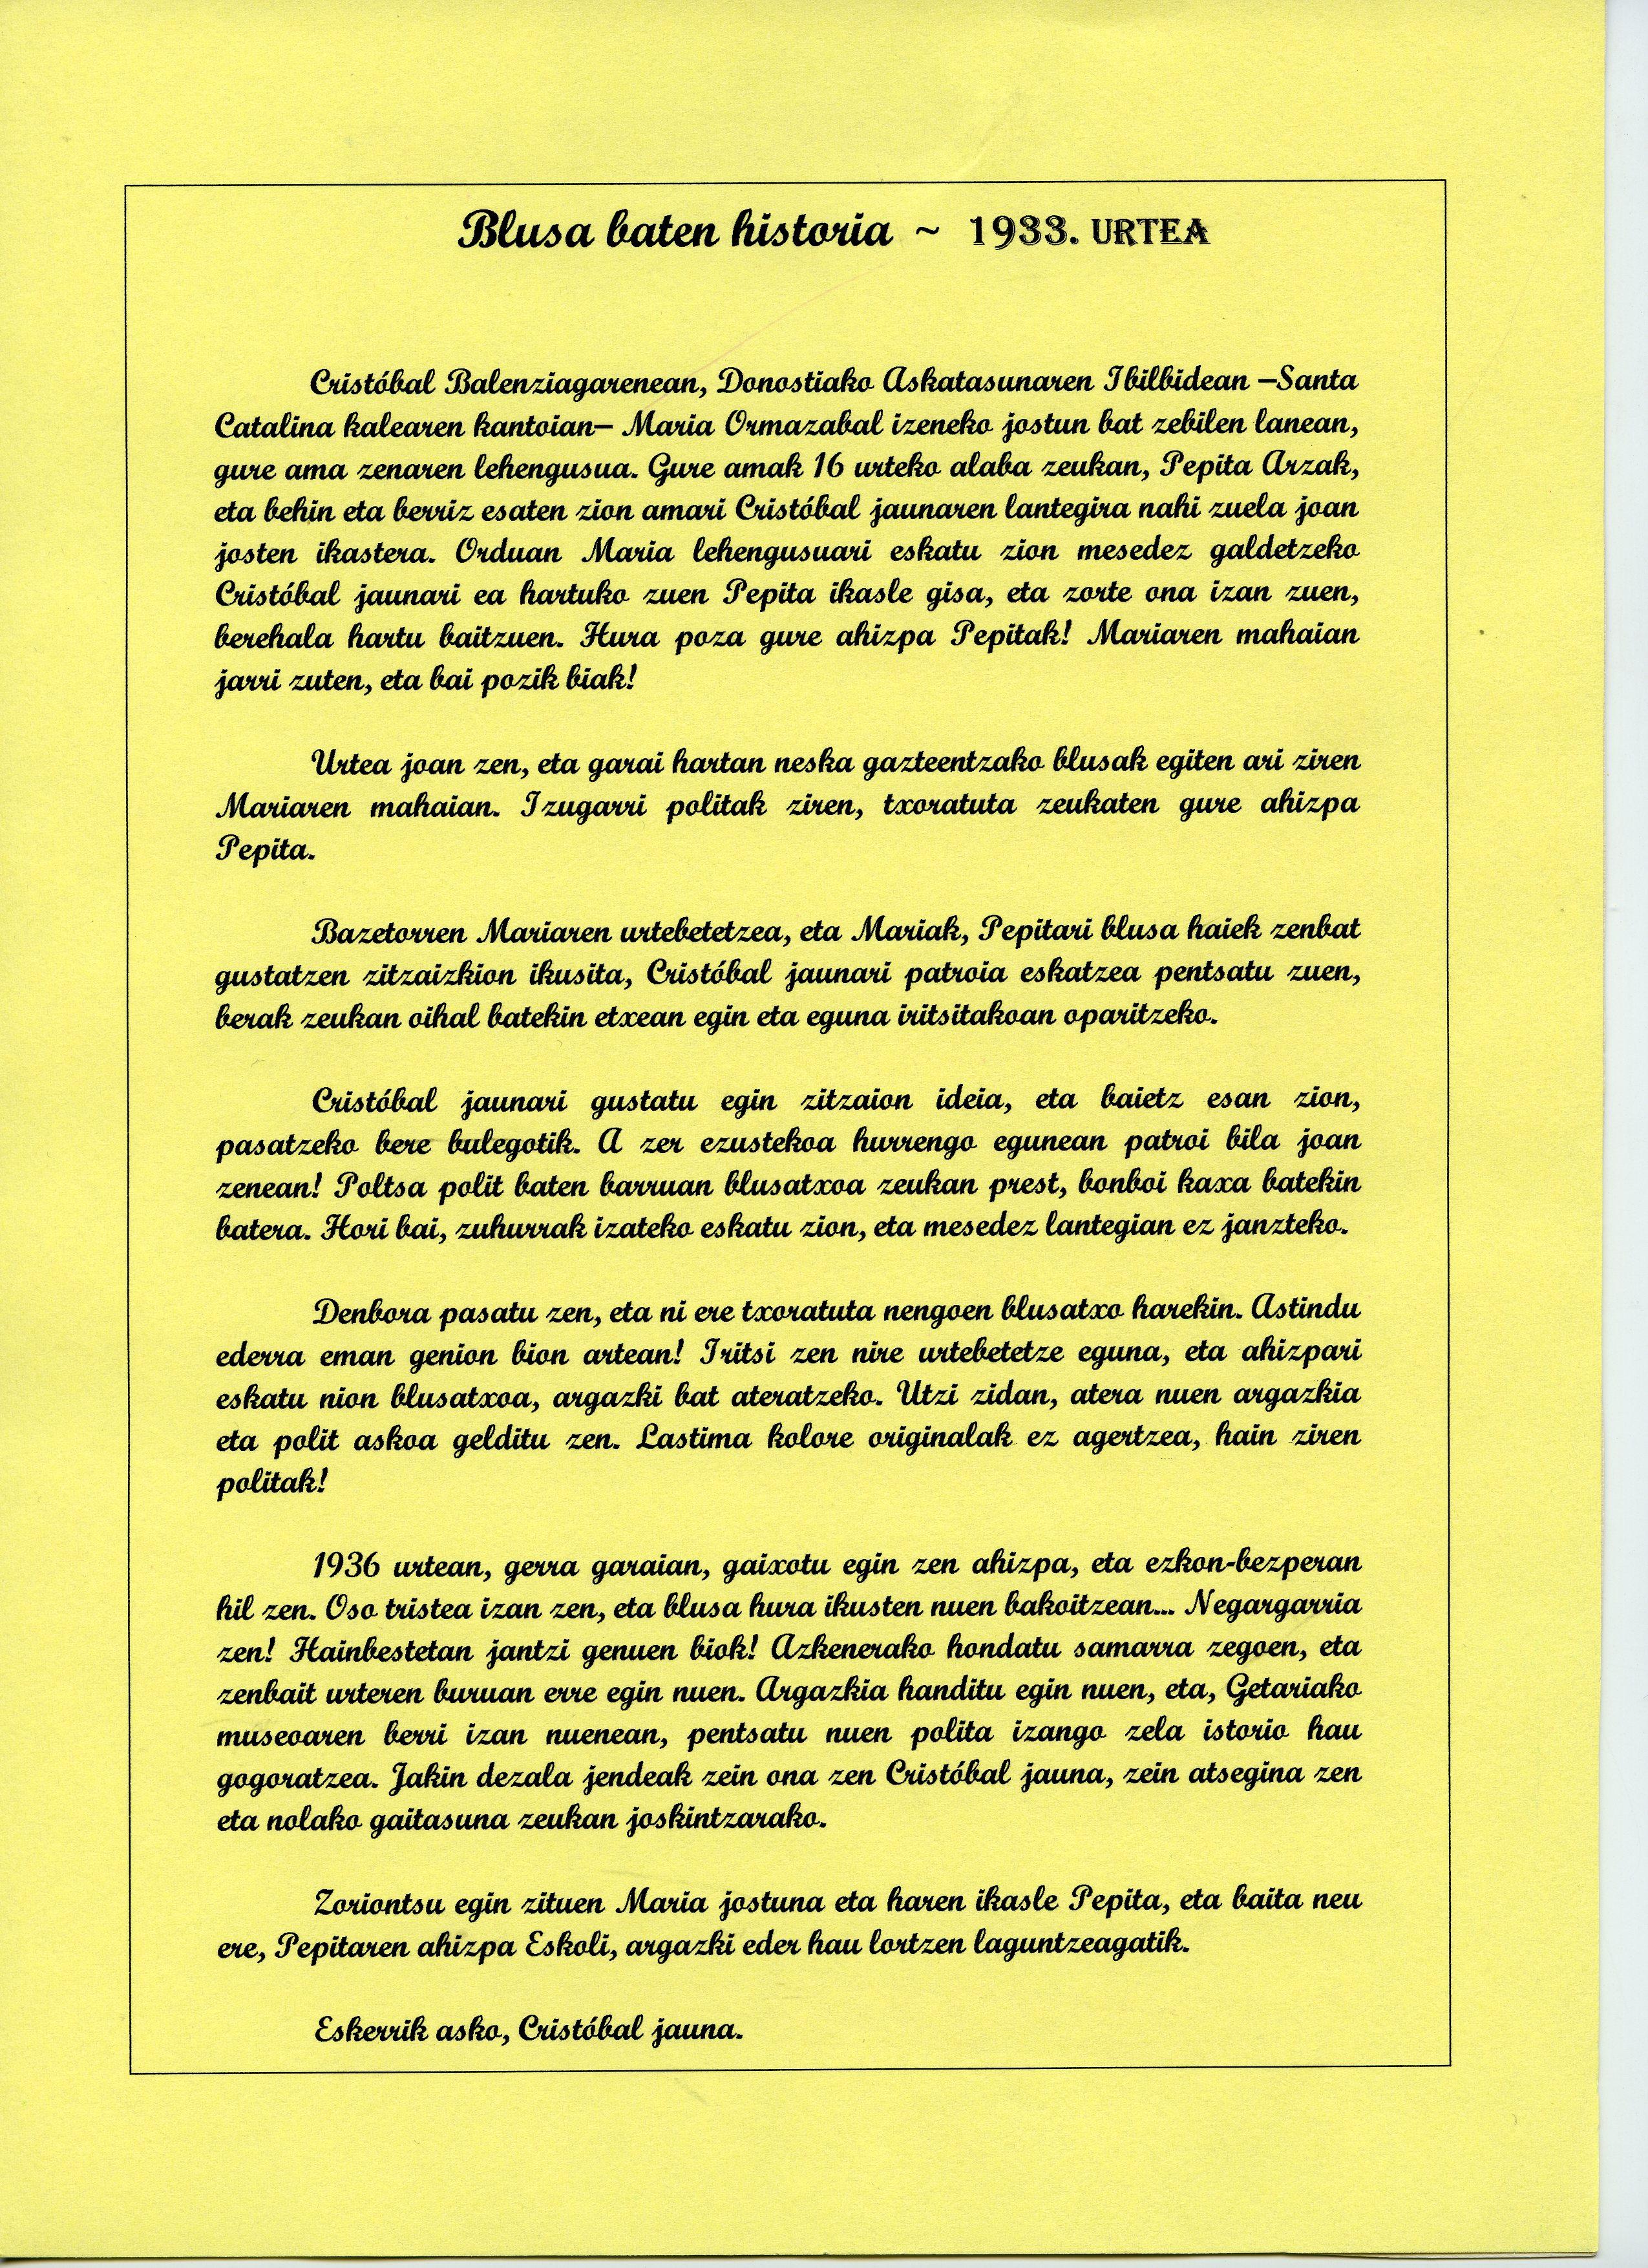 Documento escrito y firma de Escolastica Arzak Mugica